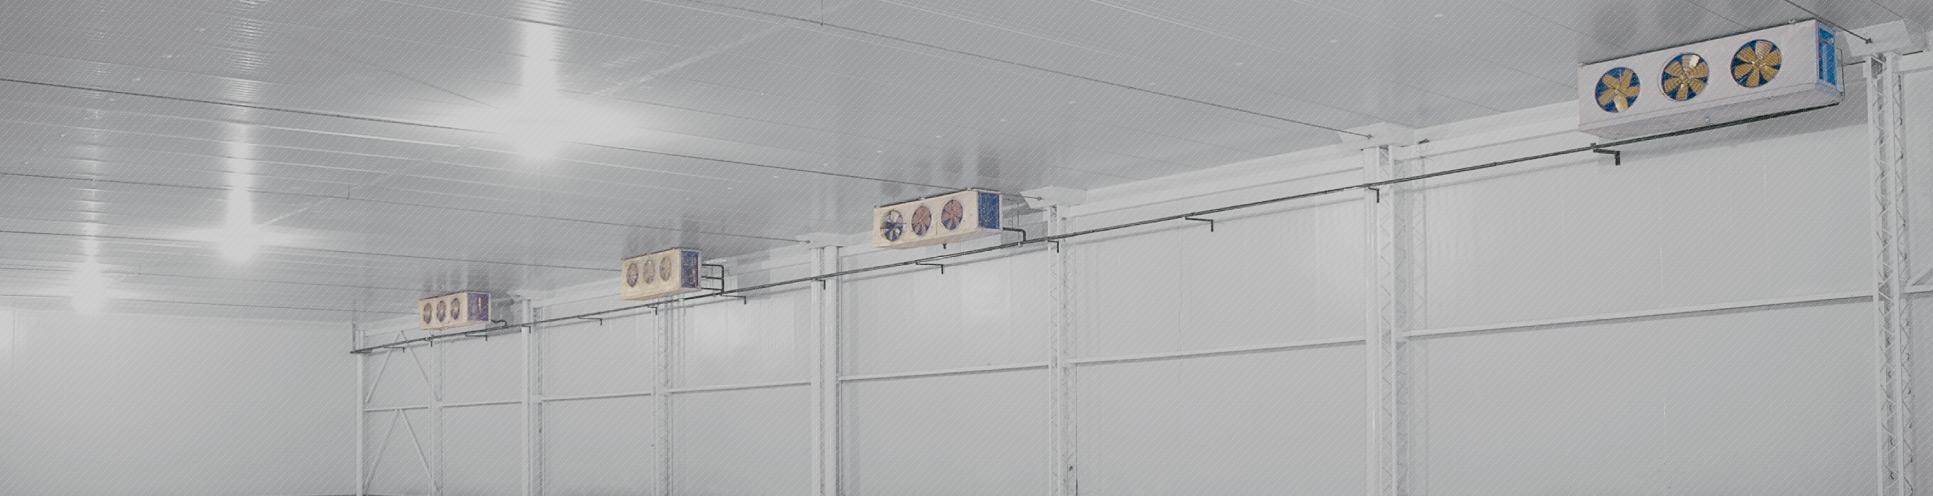 Slide Curso de Refrigeracion